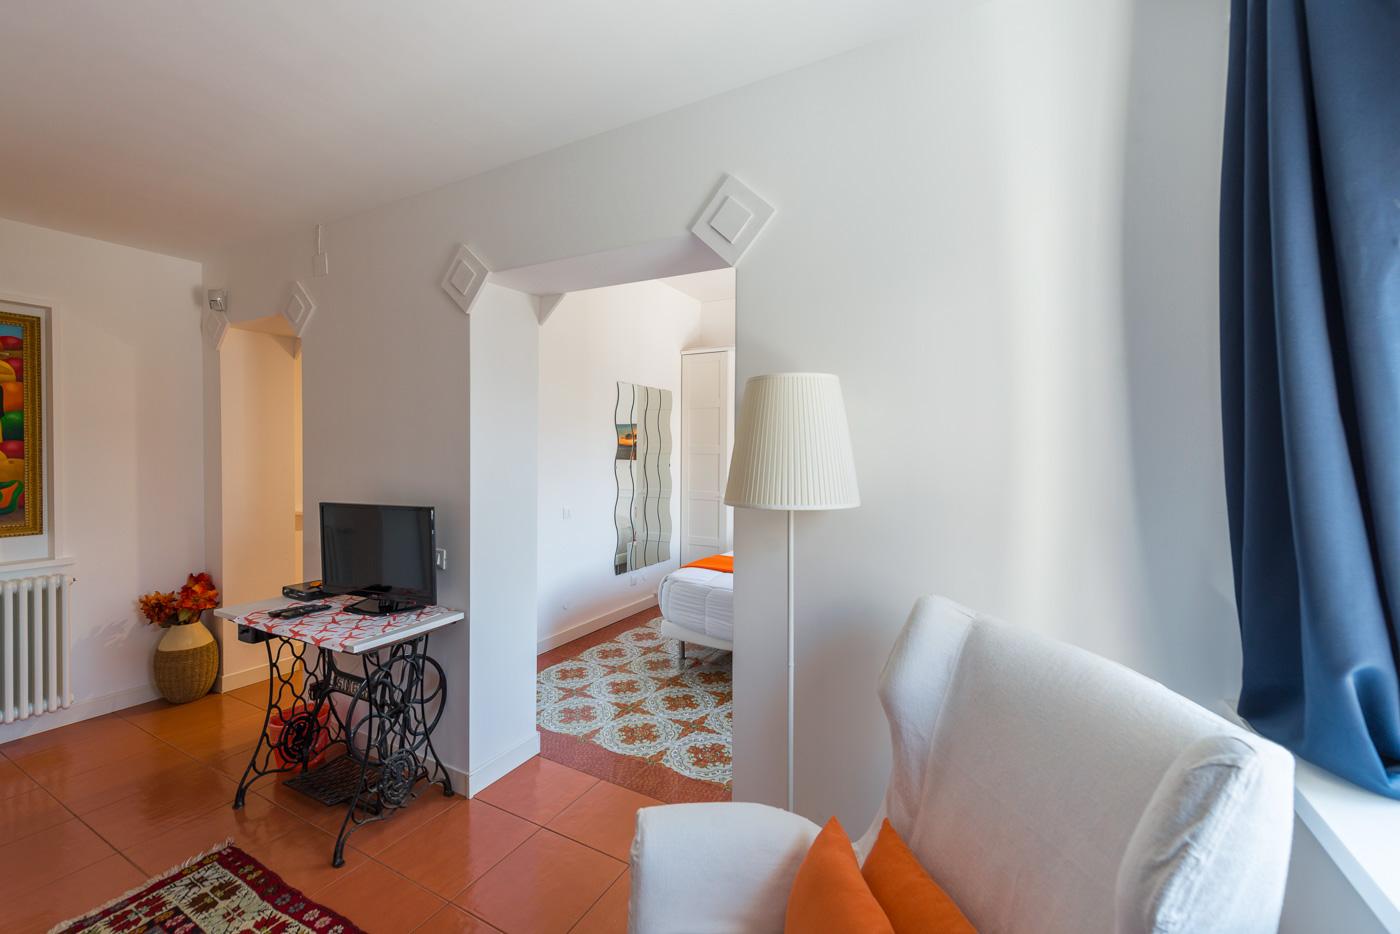 B&B hotel architetture archittetura Palermo sicily Photography  Fotografia